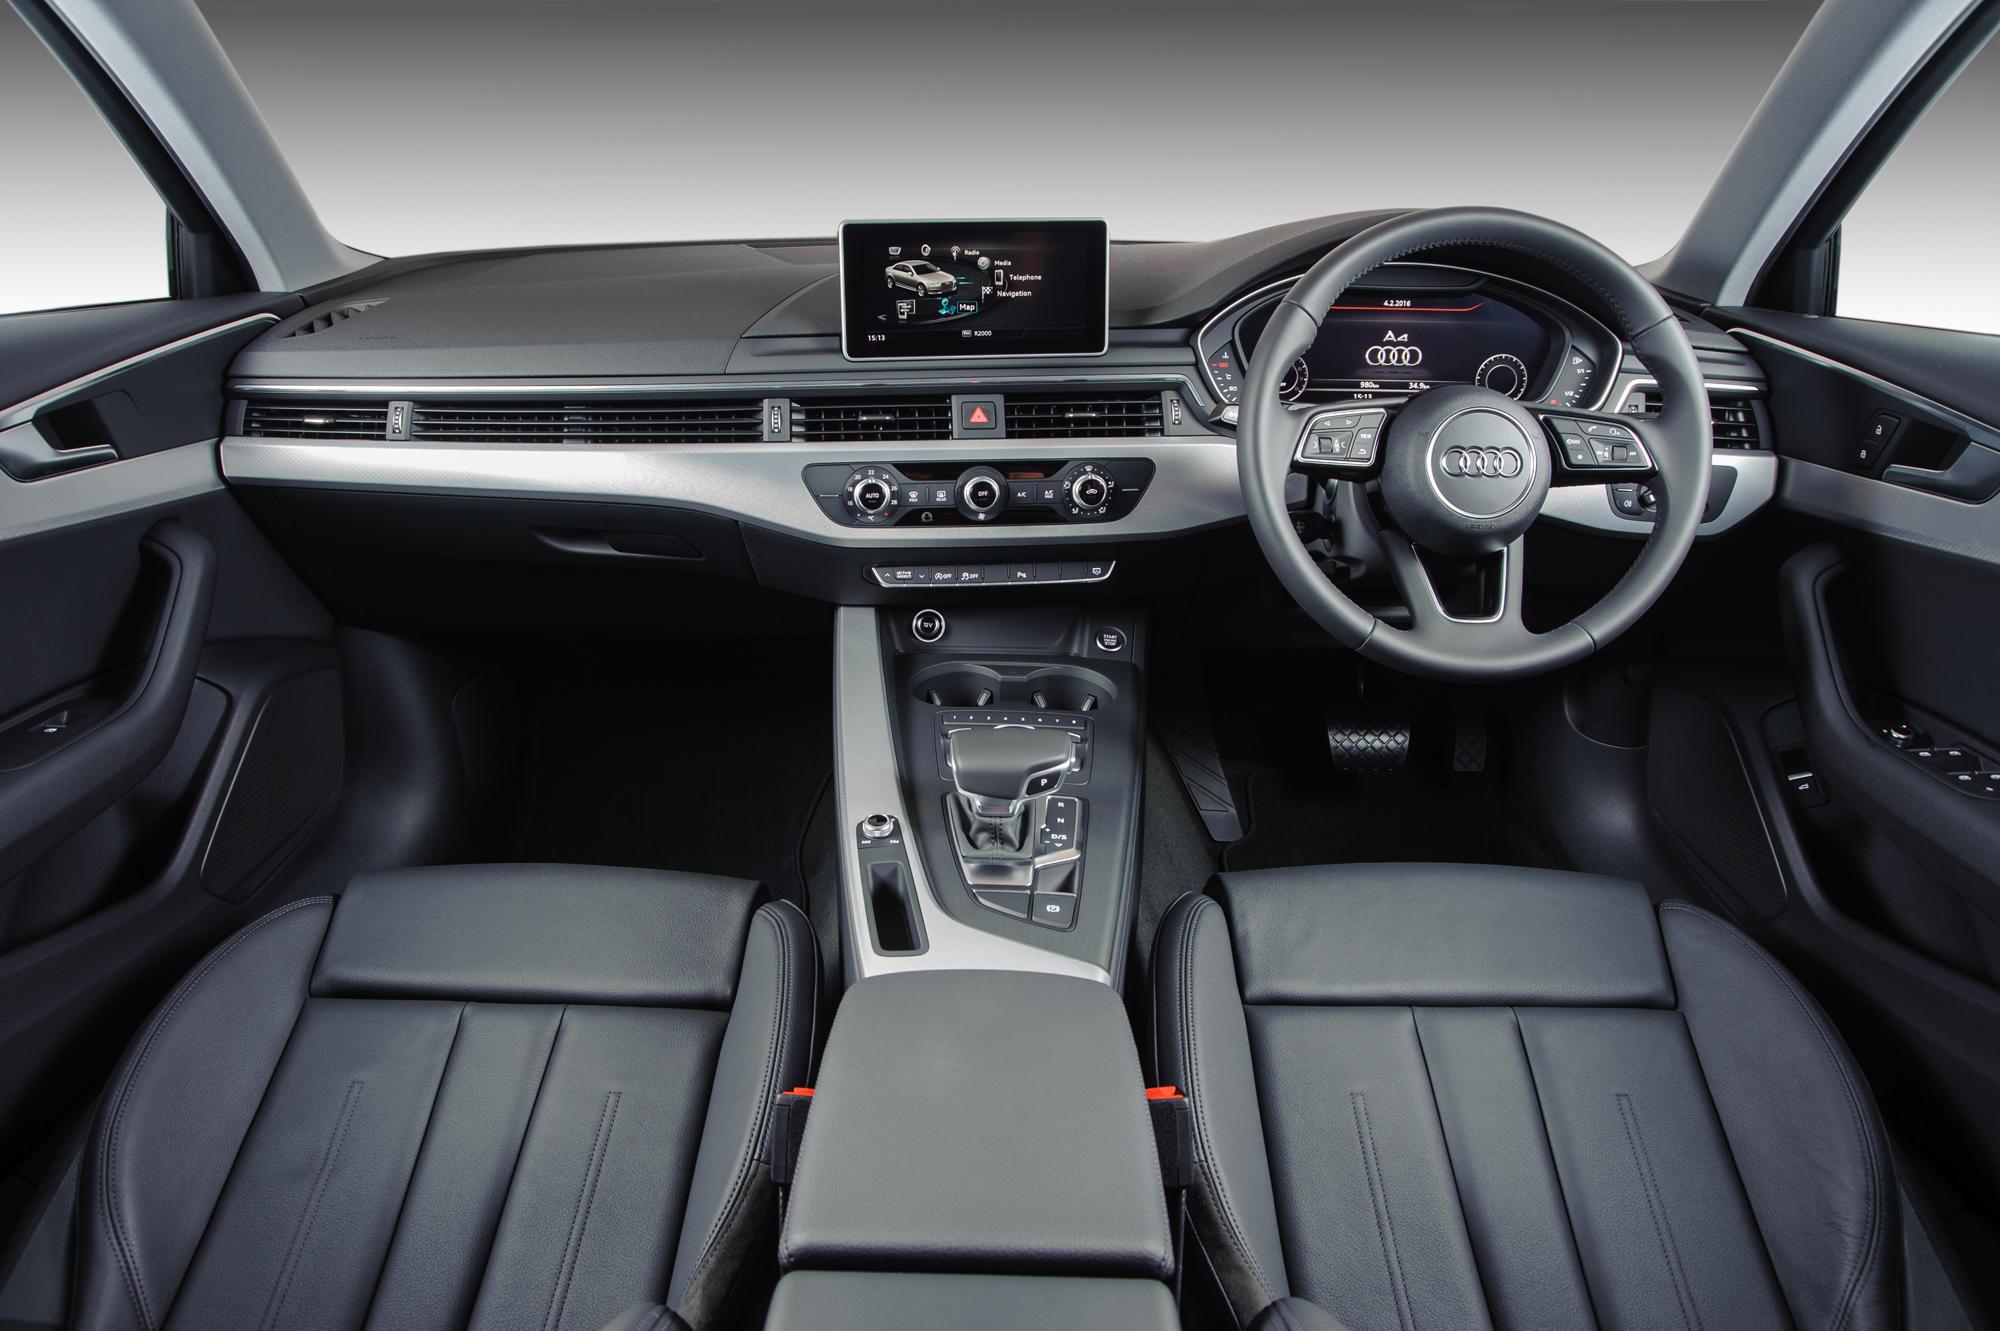 24_Audi A4_72dpi